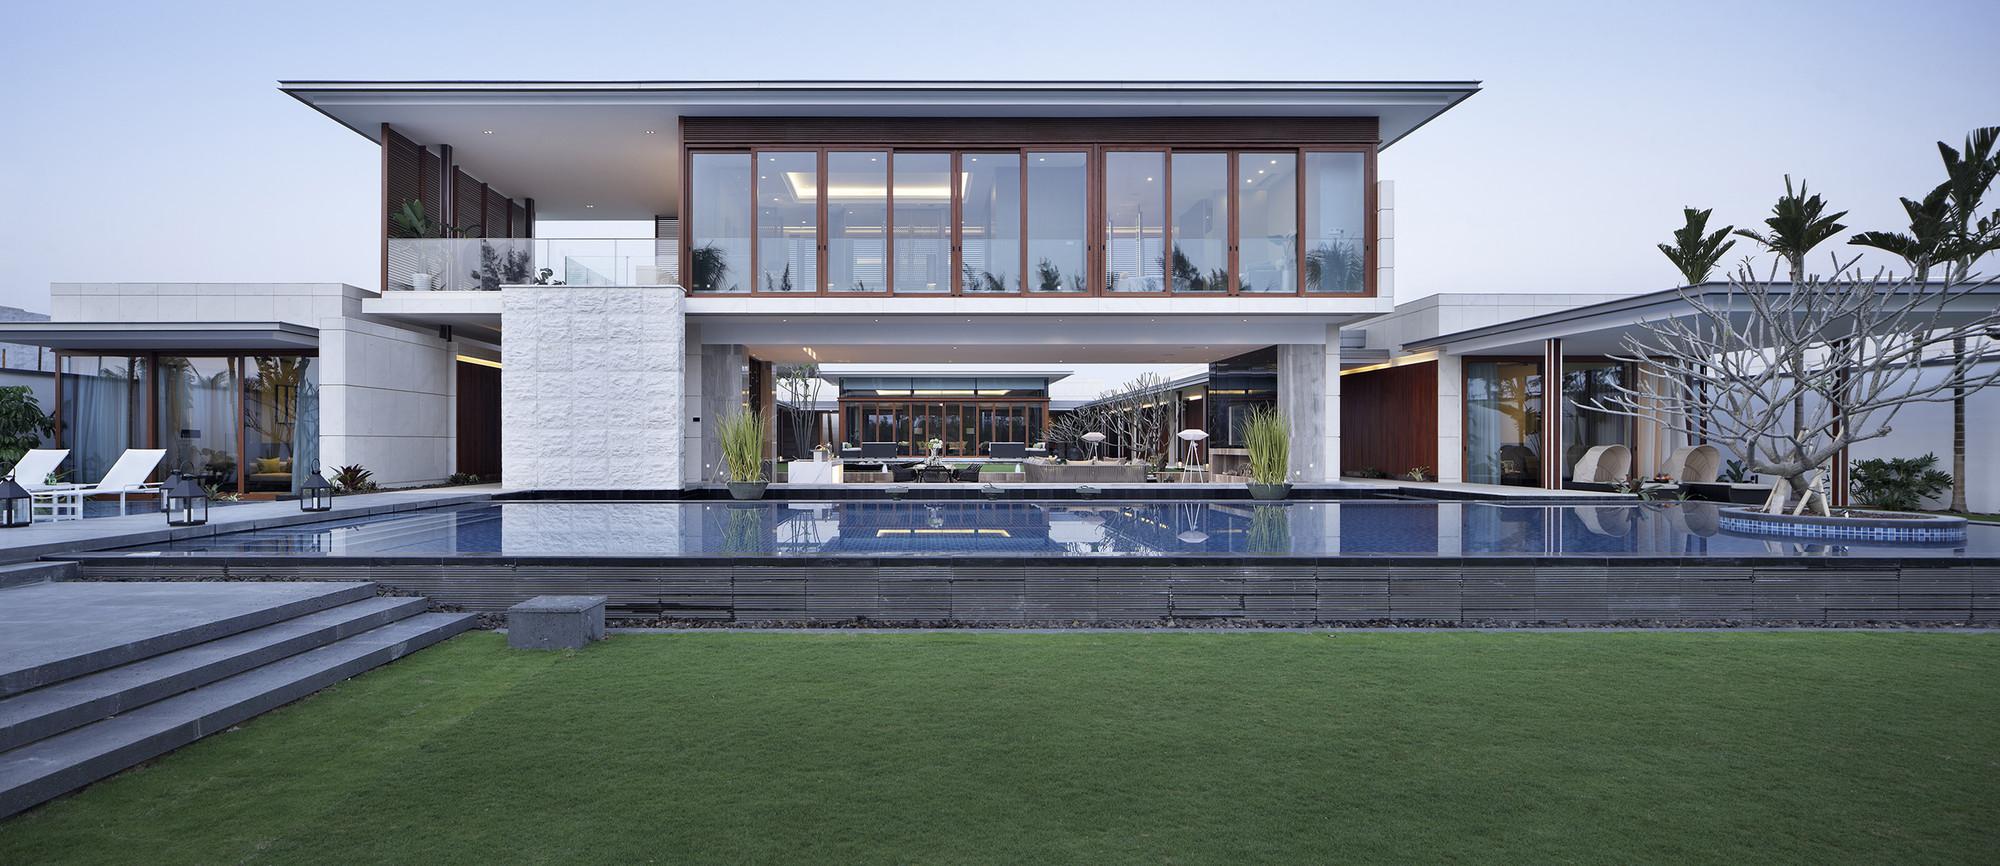 Chenglu Villa Gad - 10